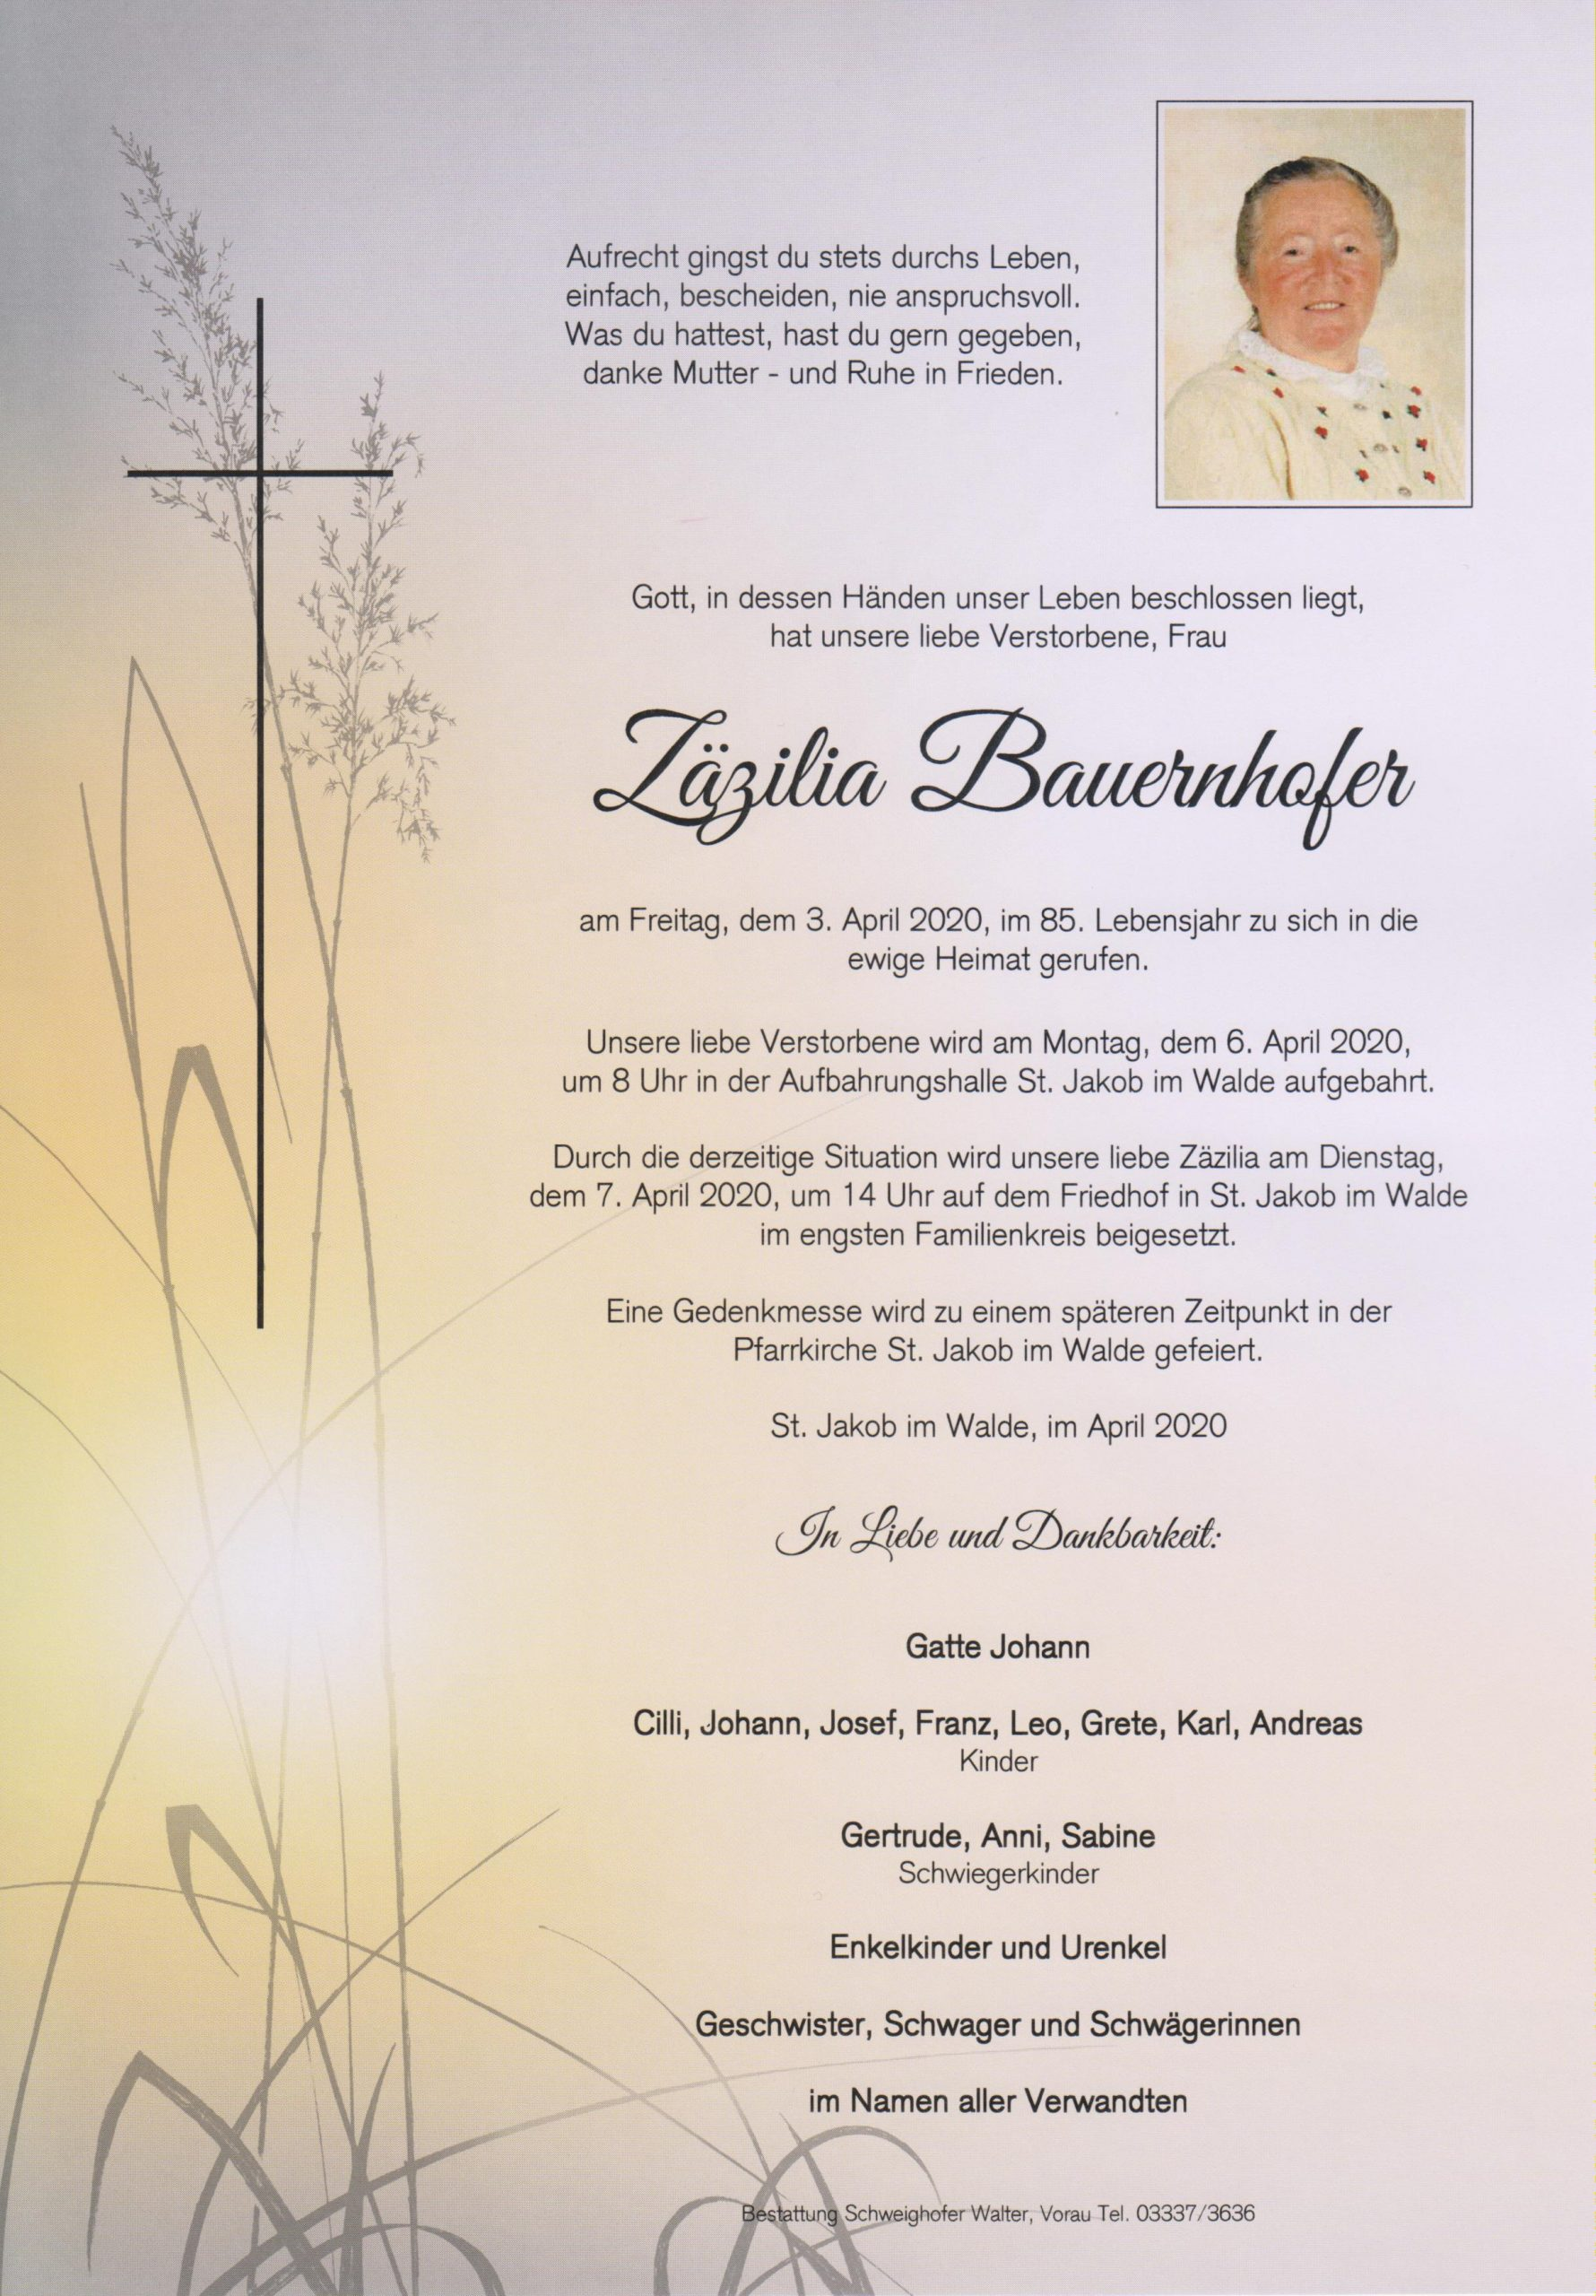 Zäzilia Bauernhofer